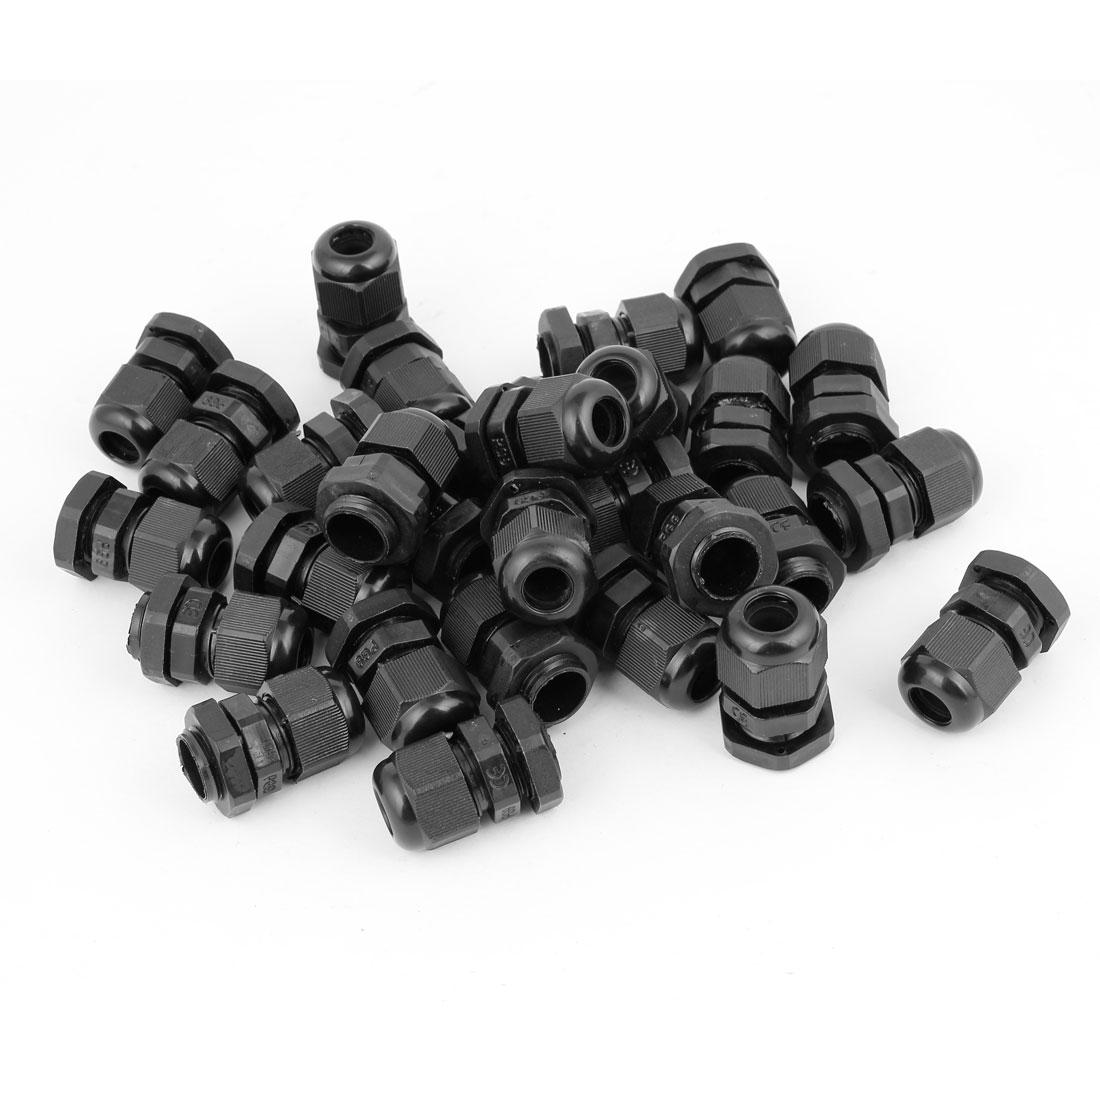 Unique Bargains 36 x Black Plastic 15.5mm Thread Cable Glands Adapter Joint PG9